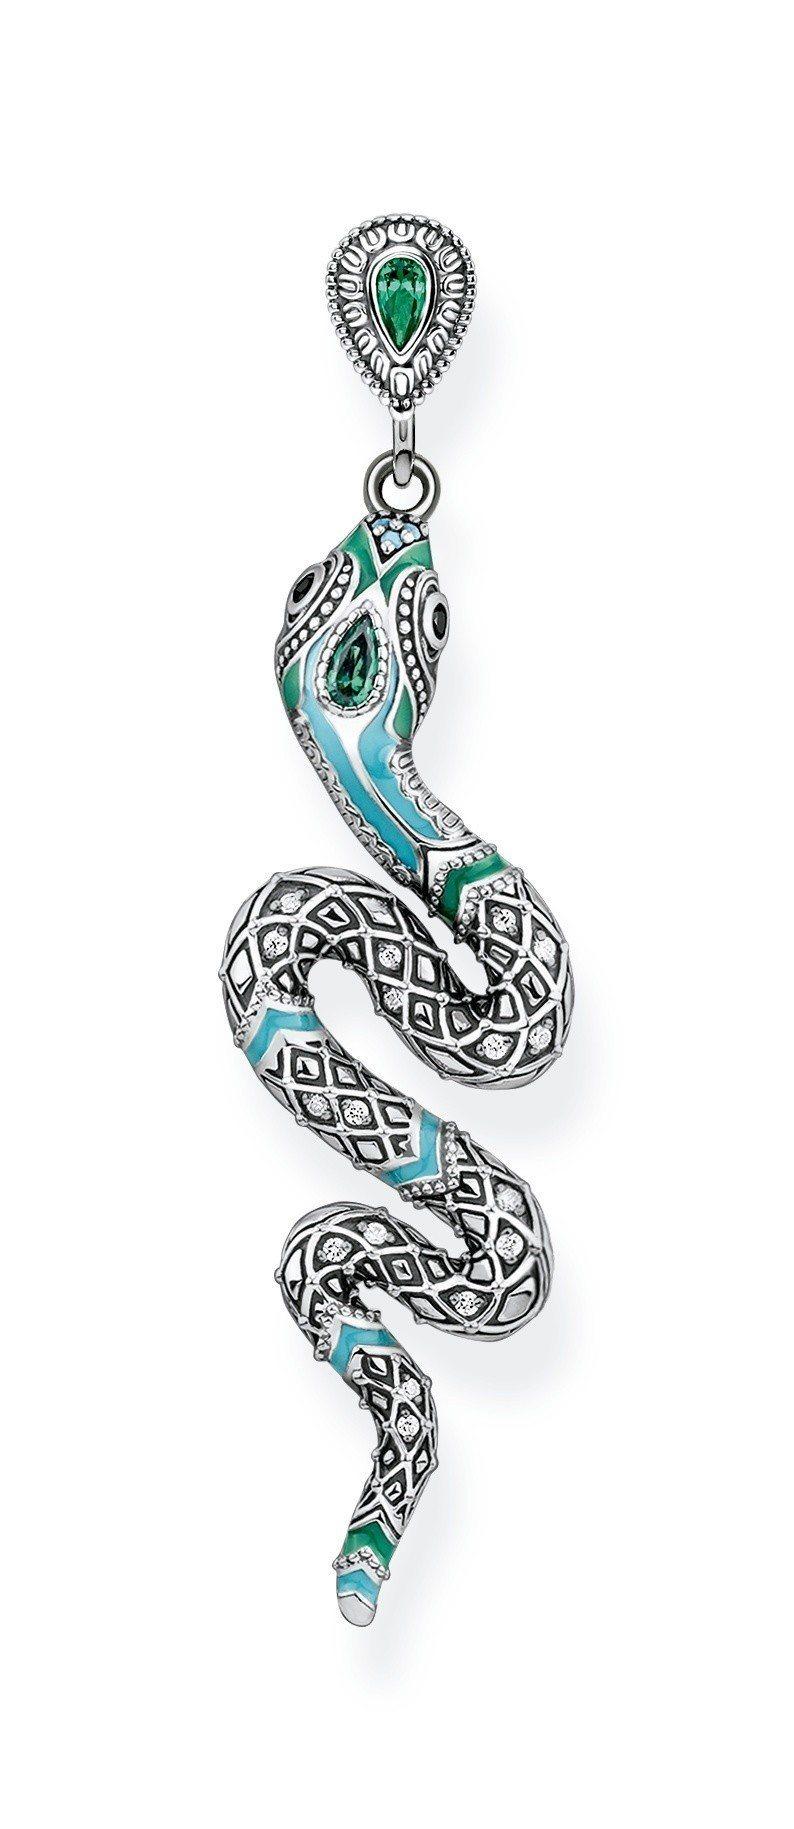 純銀神秘之蛇單支耳環,9,880元。圖/Thomas Sabo提供